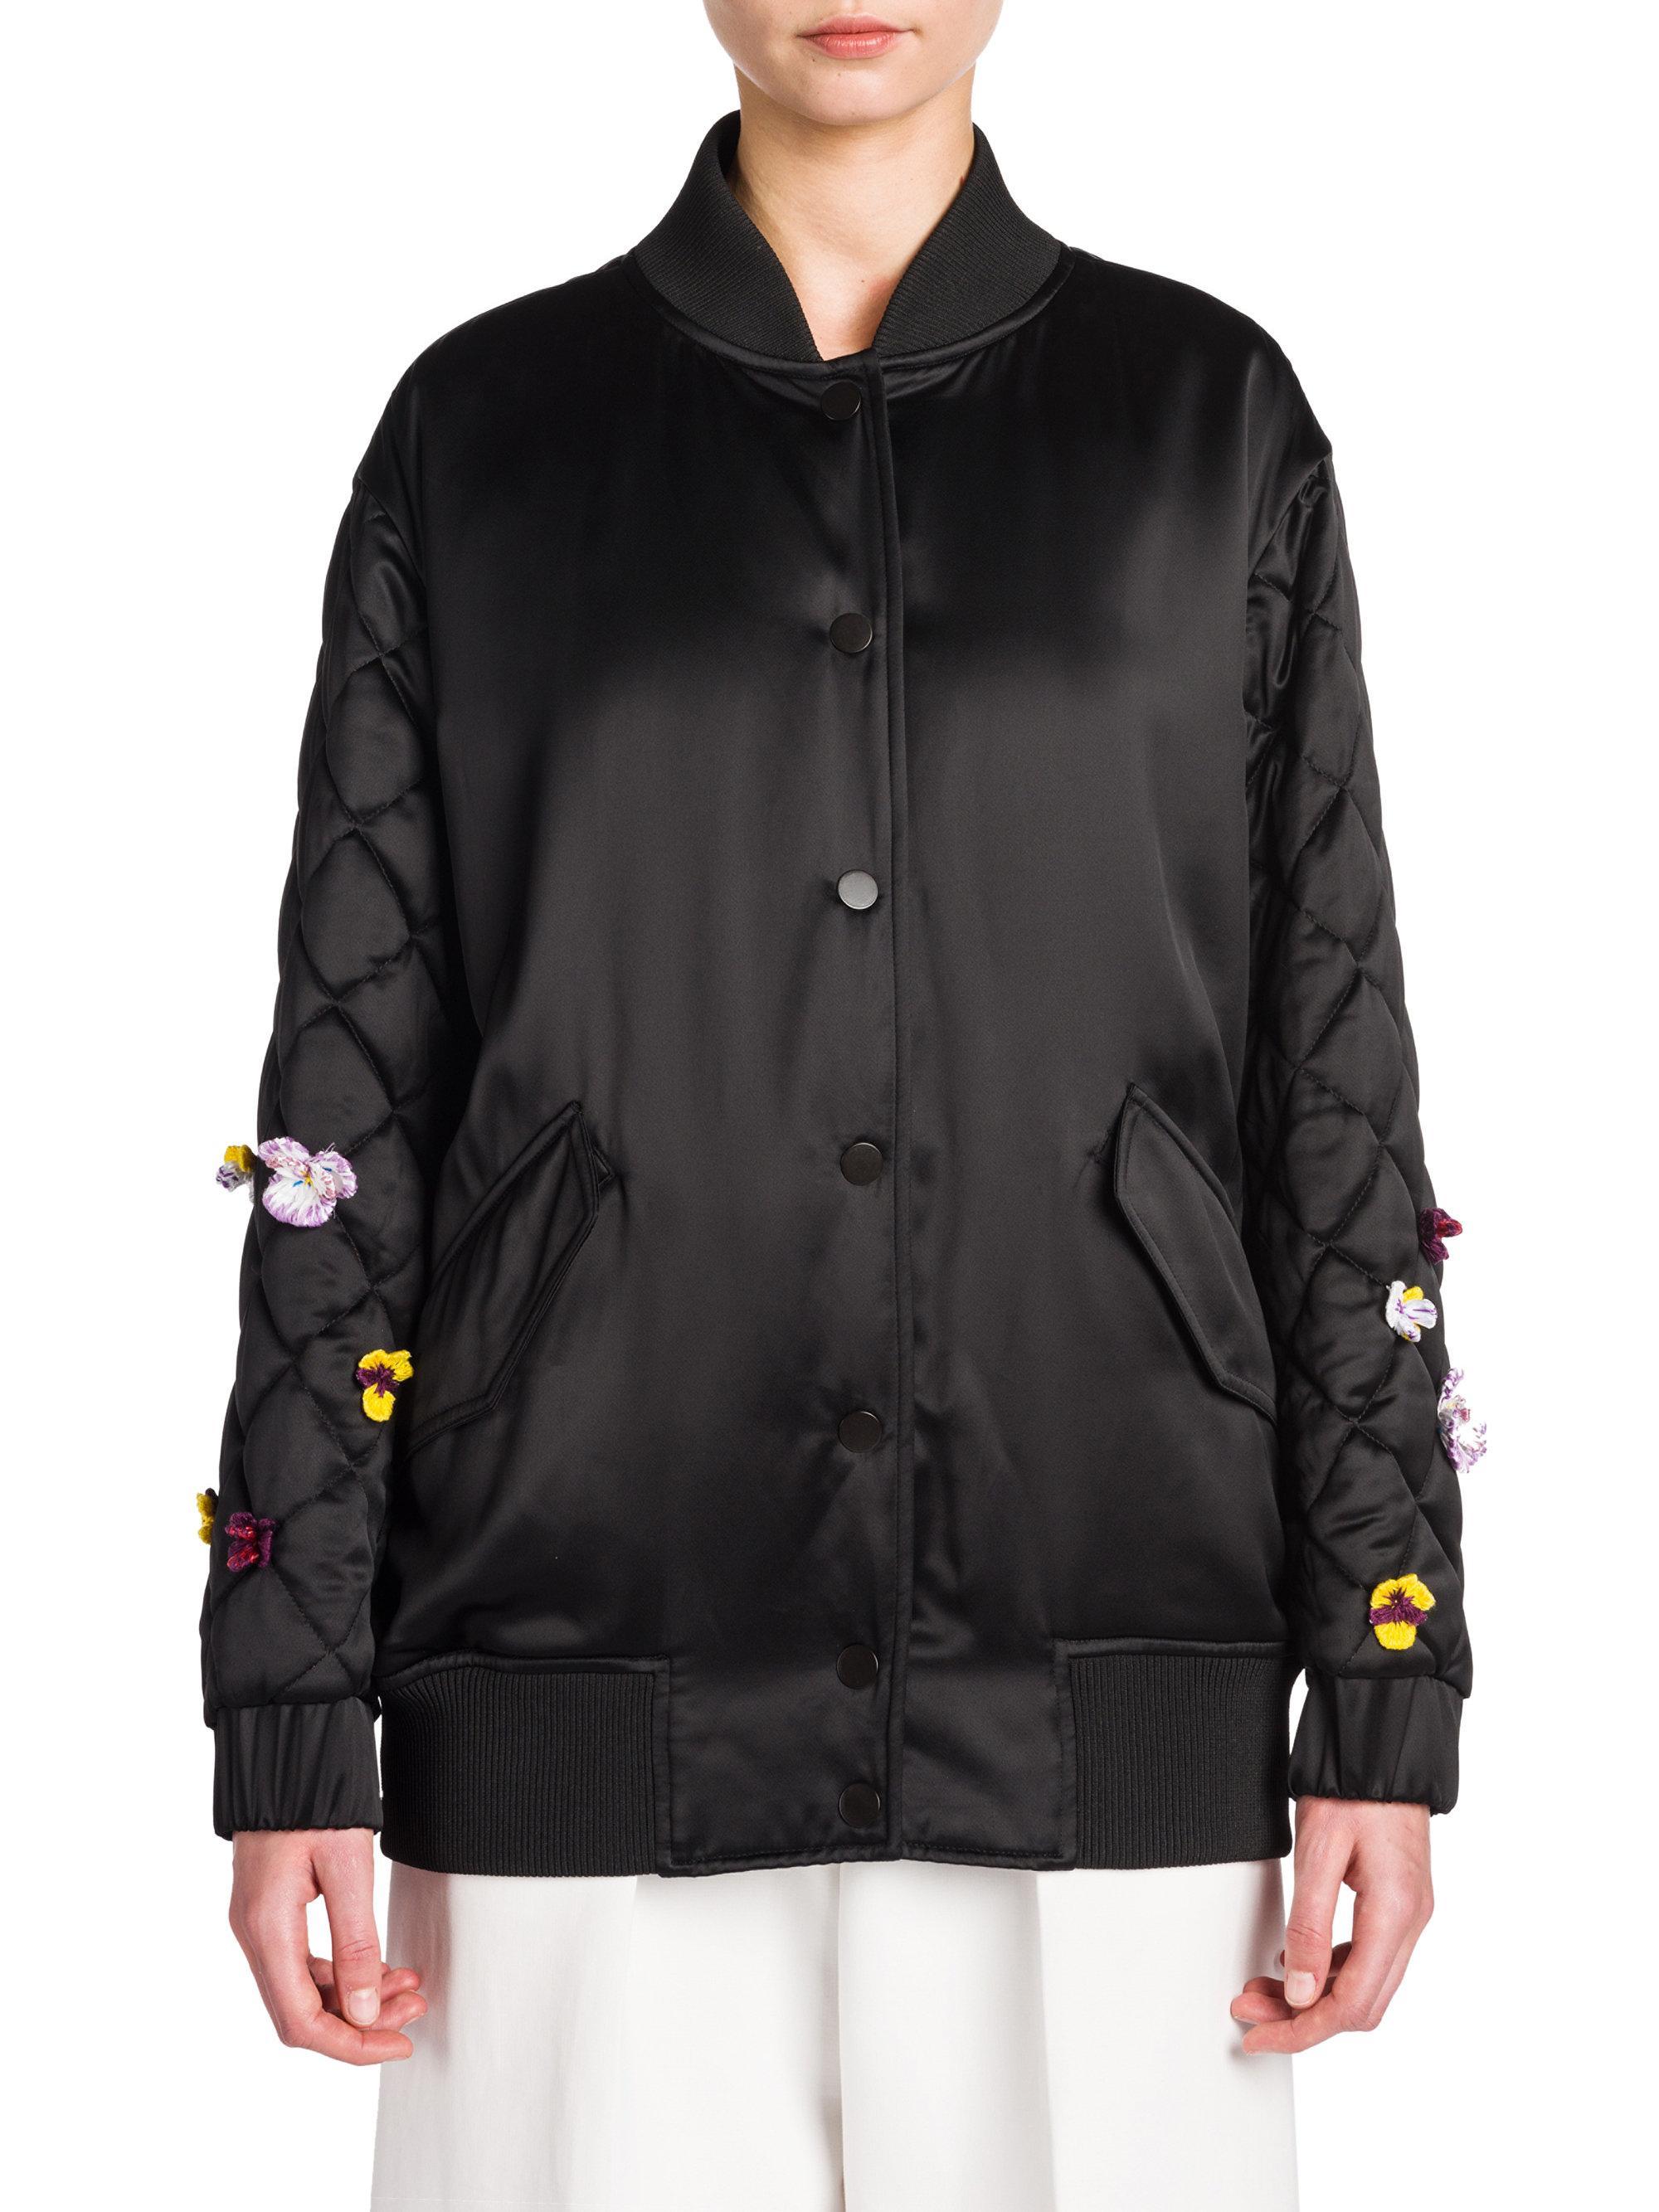 Fendi Emroidered Satin Bomber Jacket in Black